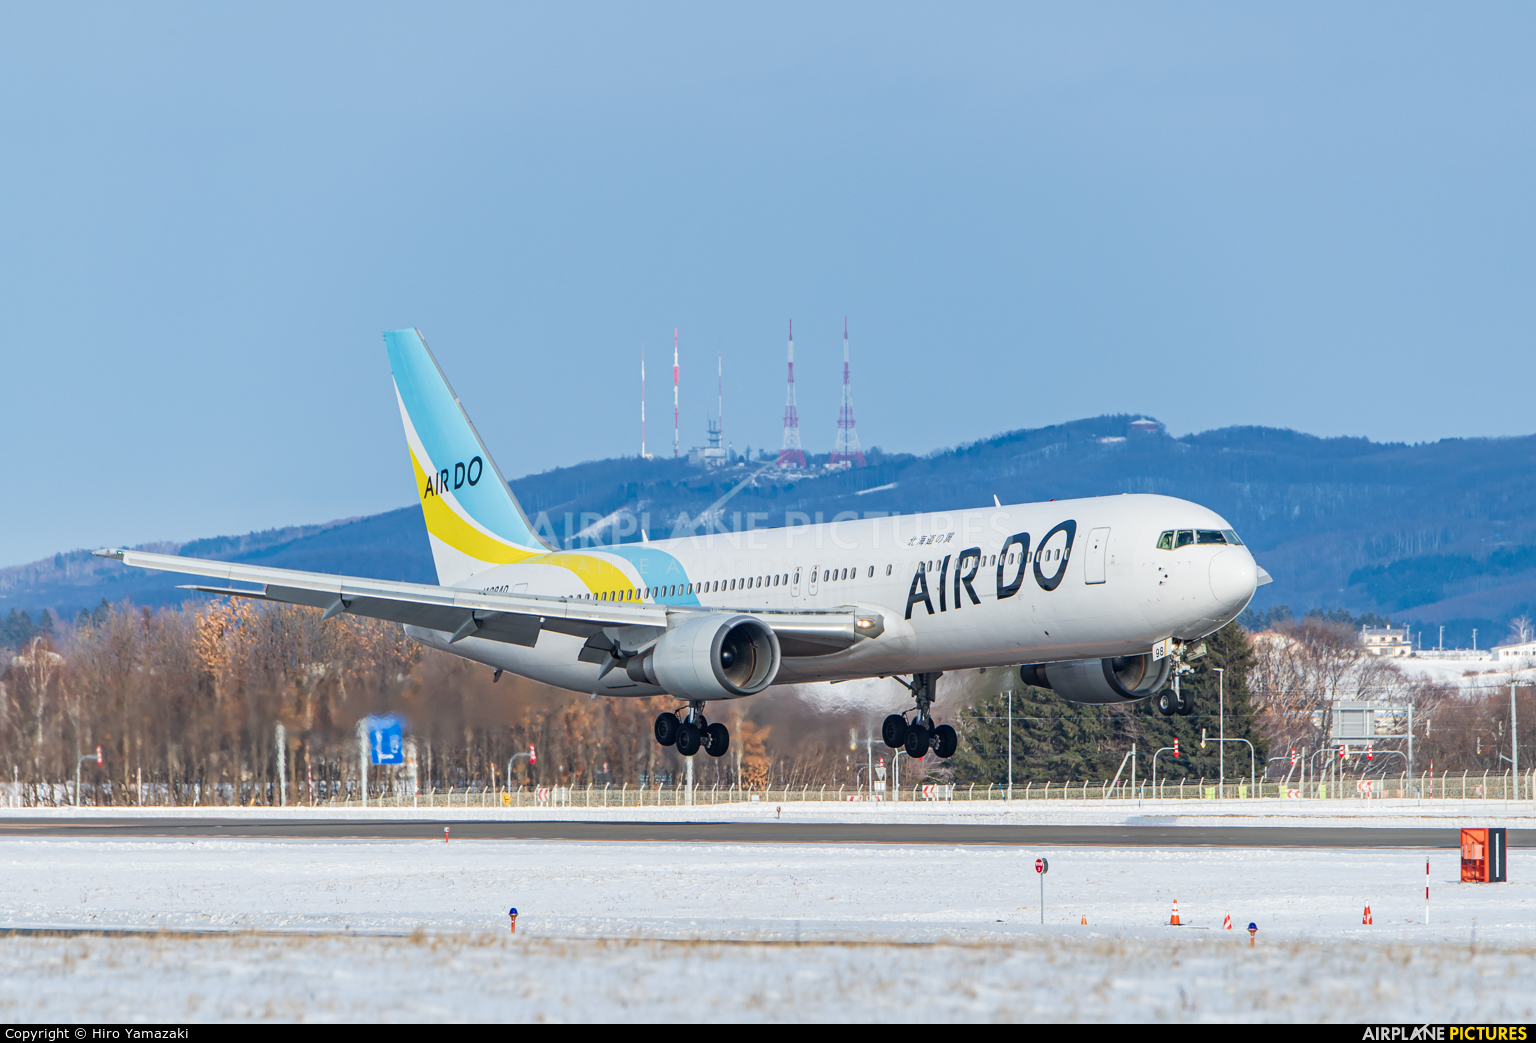 Air Do - Hokkaido International Airlines JA98AD aircraft at Memanbetsu